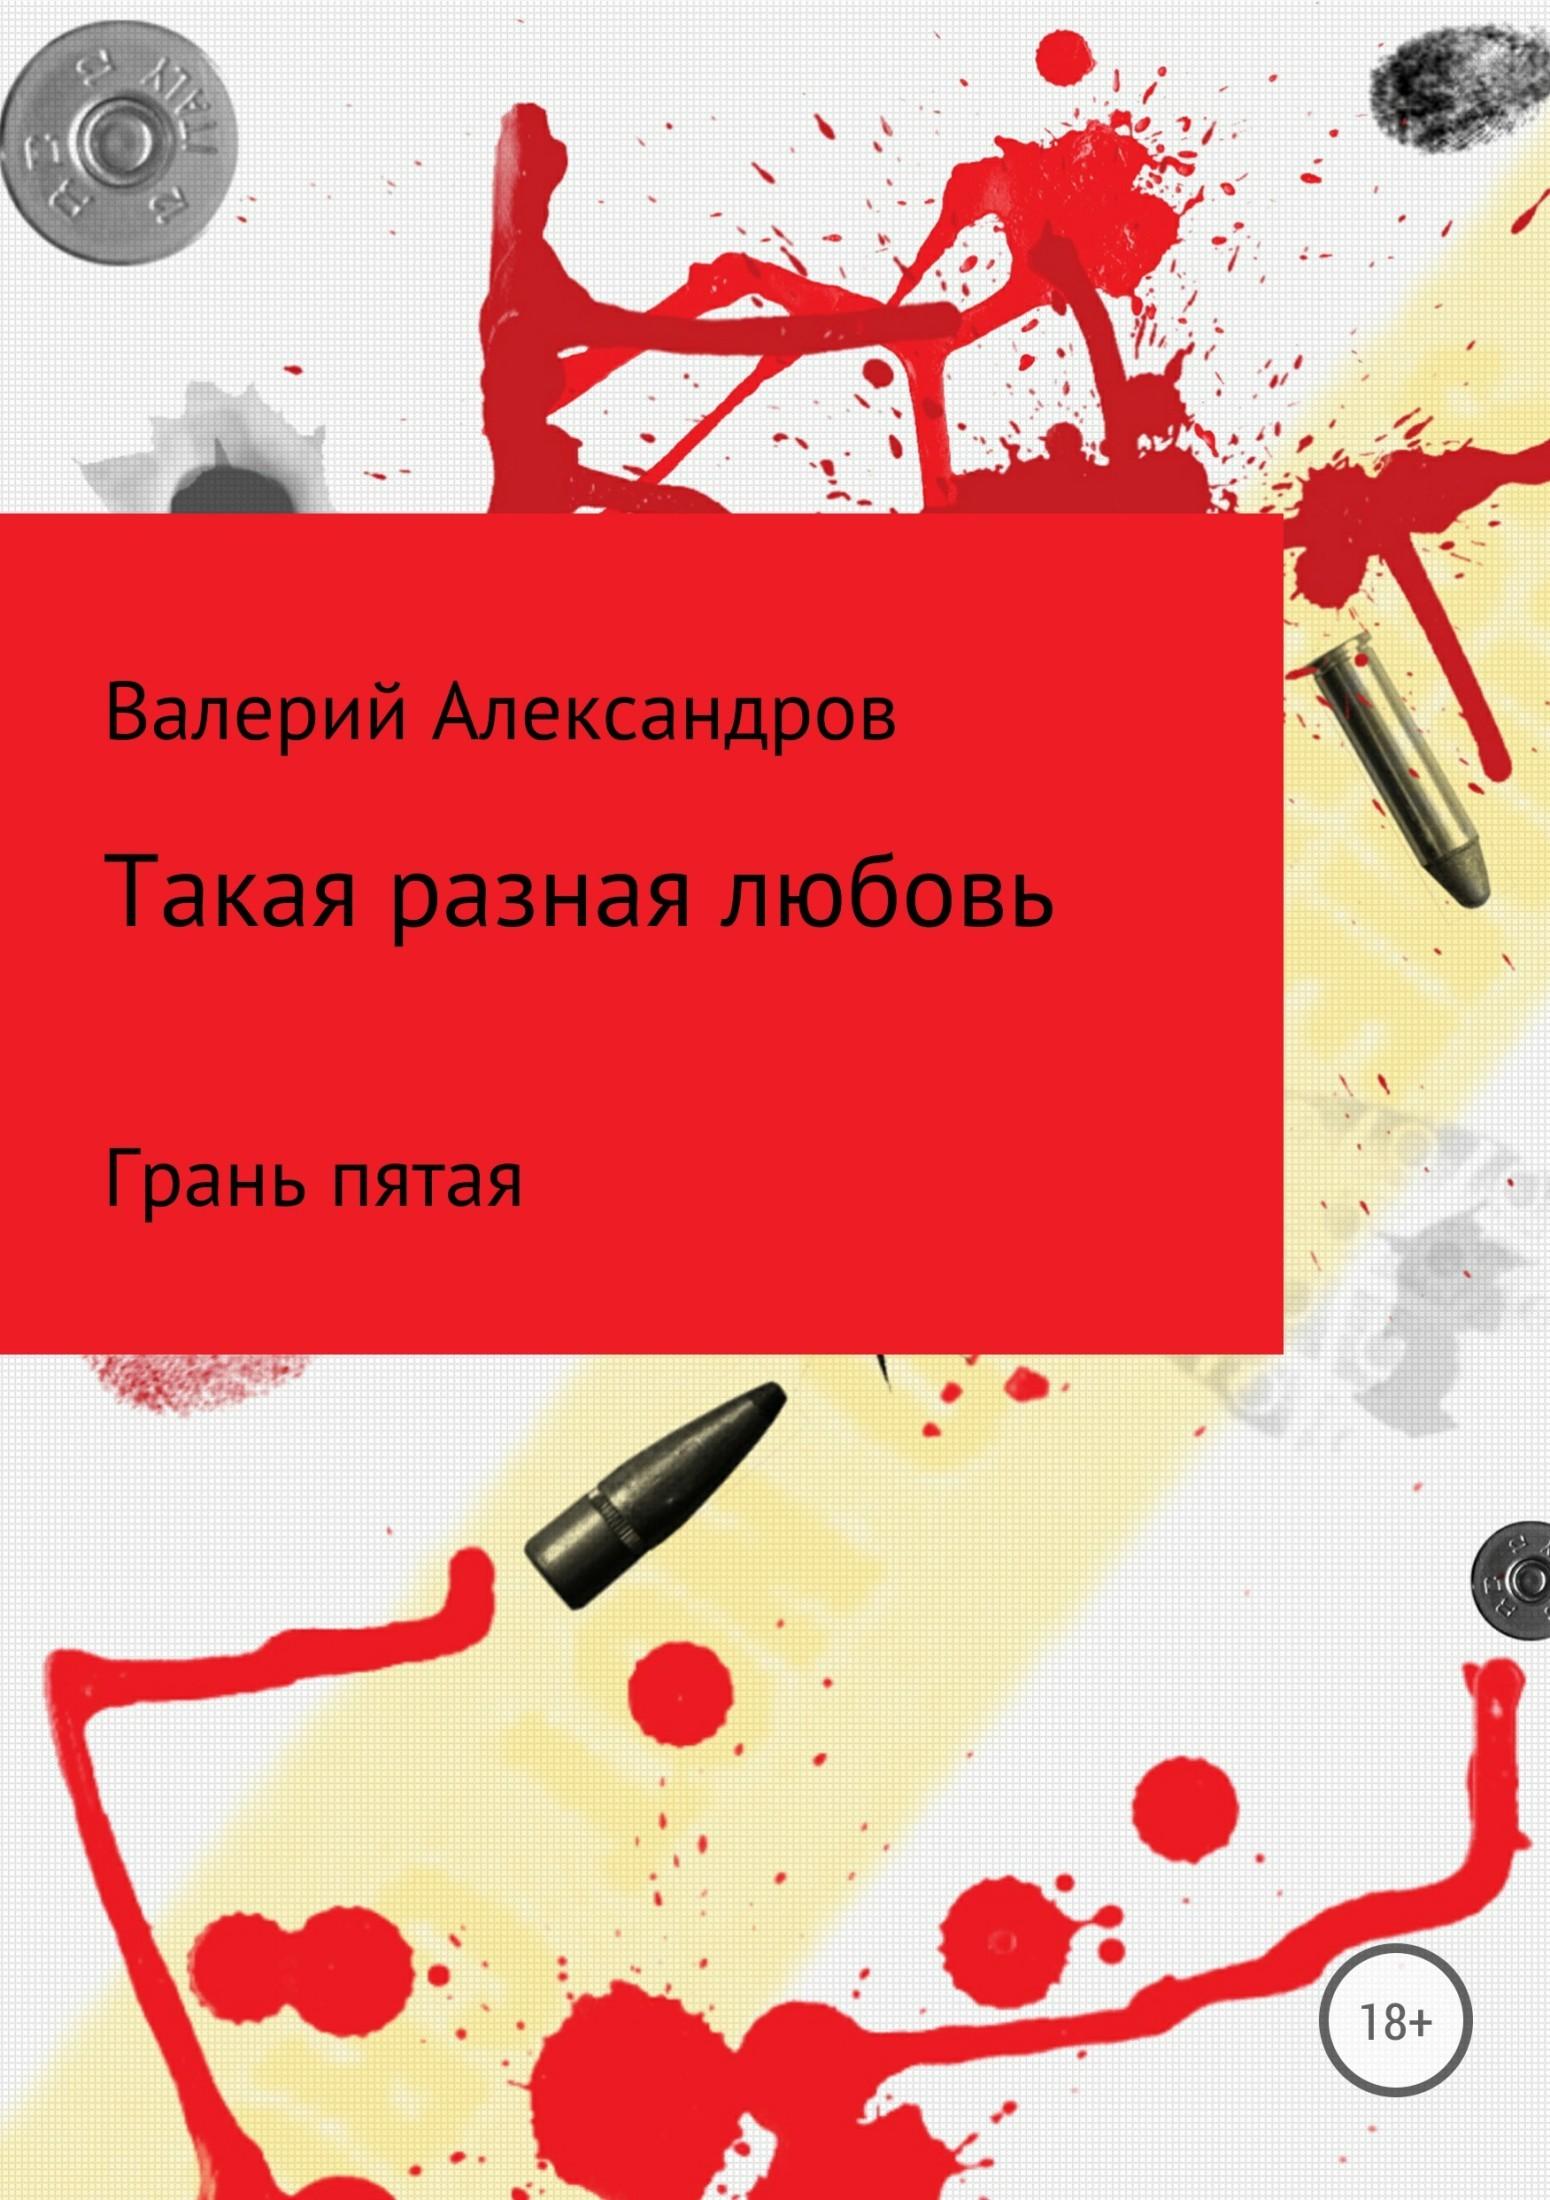 Валерий Александров Такая разная любовь 5. Сборник стихотворений цена и фото